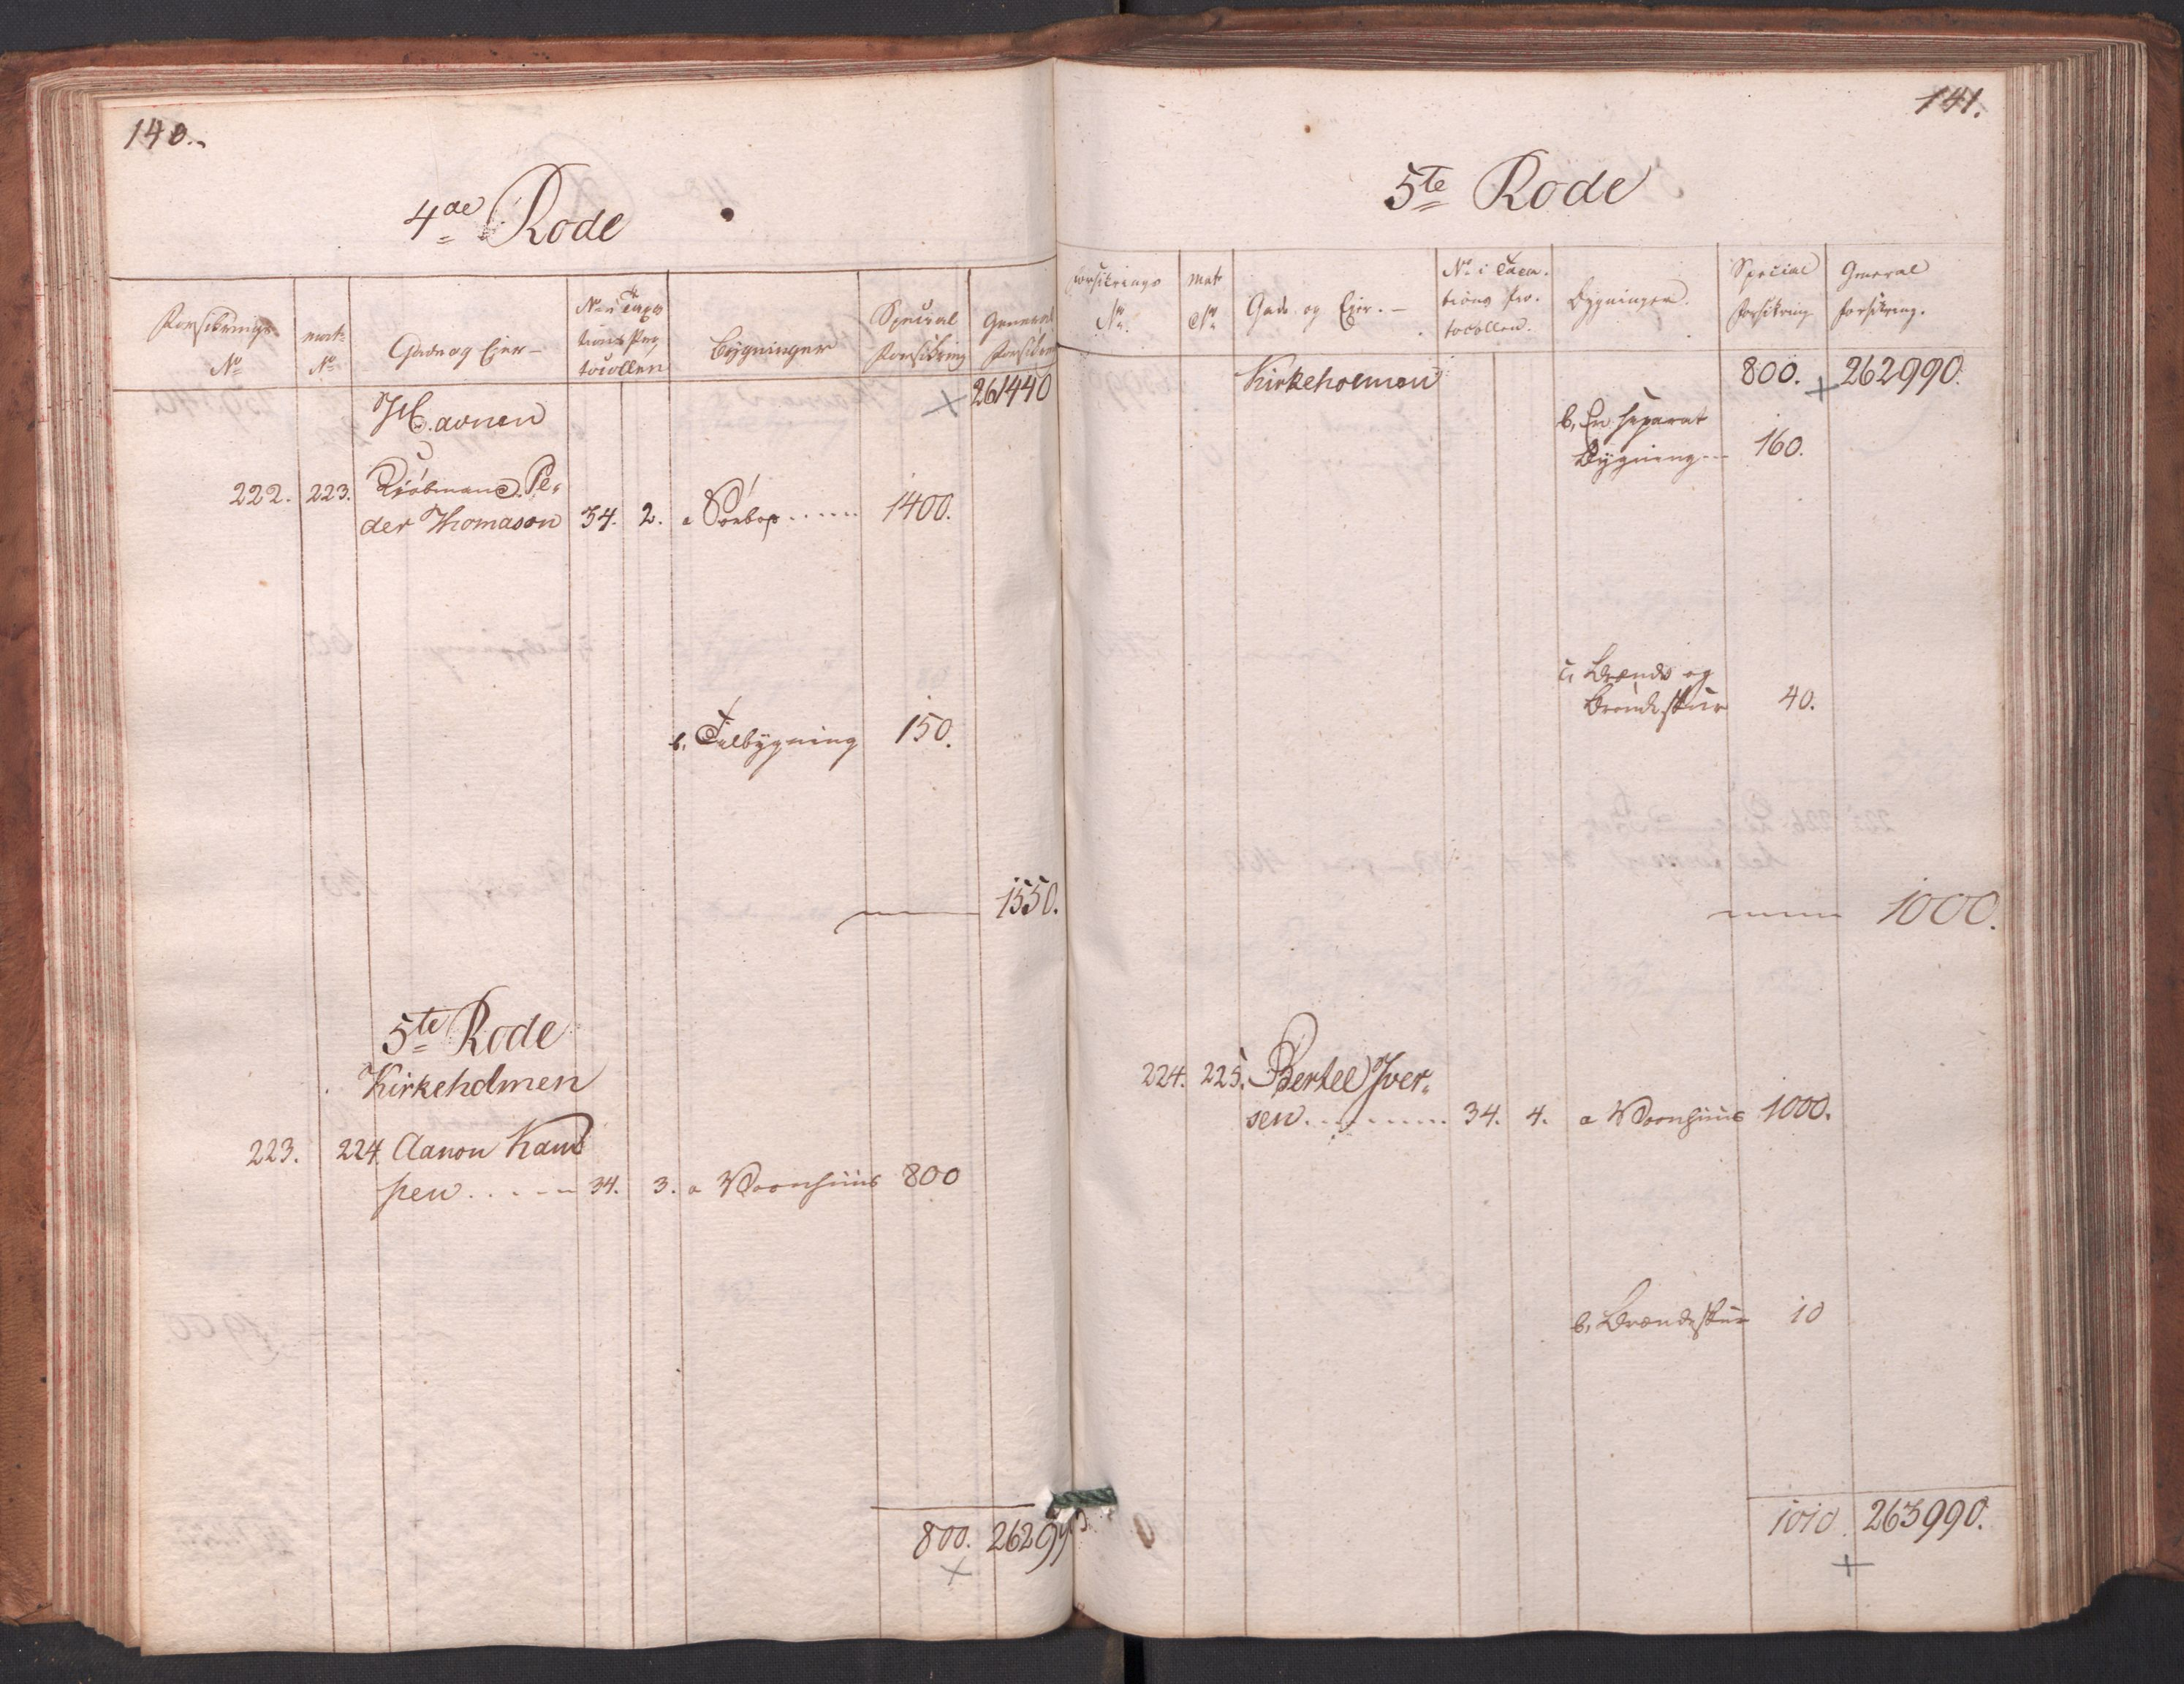 RA, Kommersekollegiet, Brannforsikringskontoret 1767-1814, F/Fa/L0003: Arendal, 1807-1817, s. 140-141